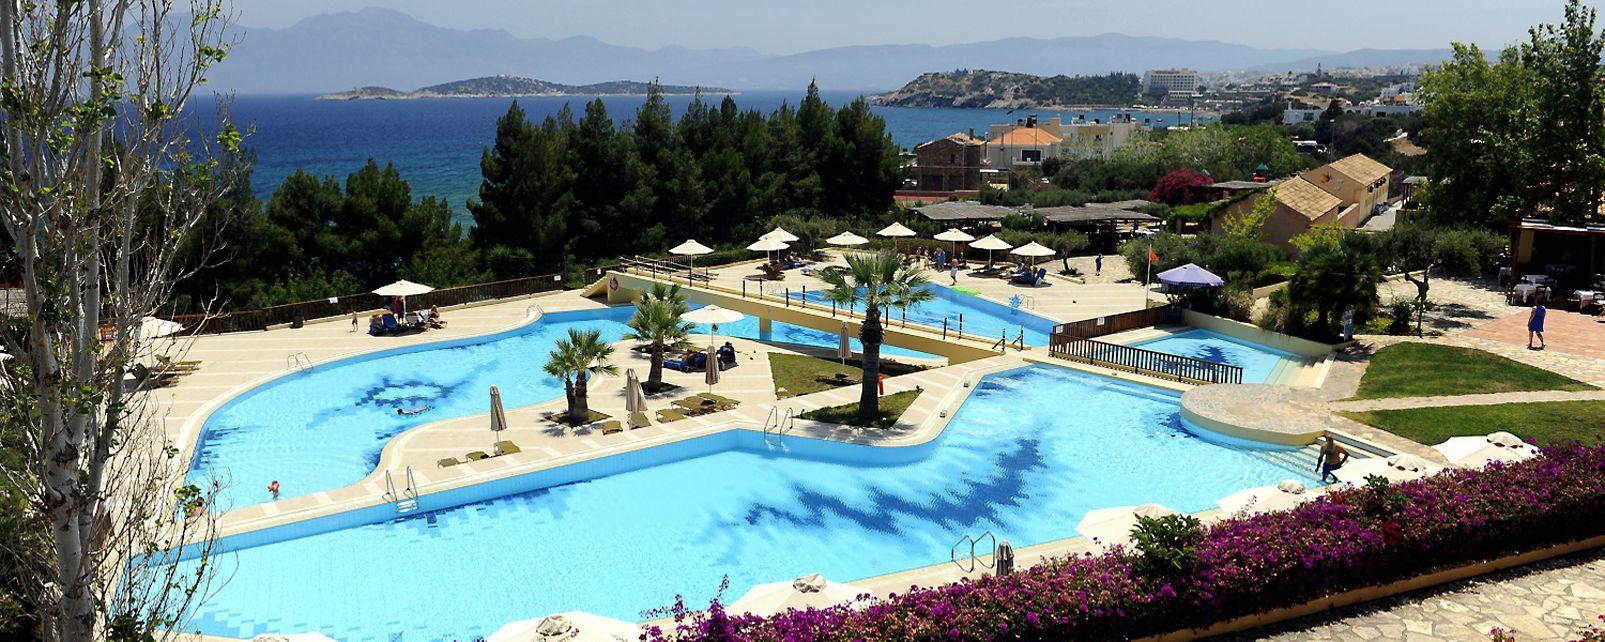 Hotel Candia Park Village